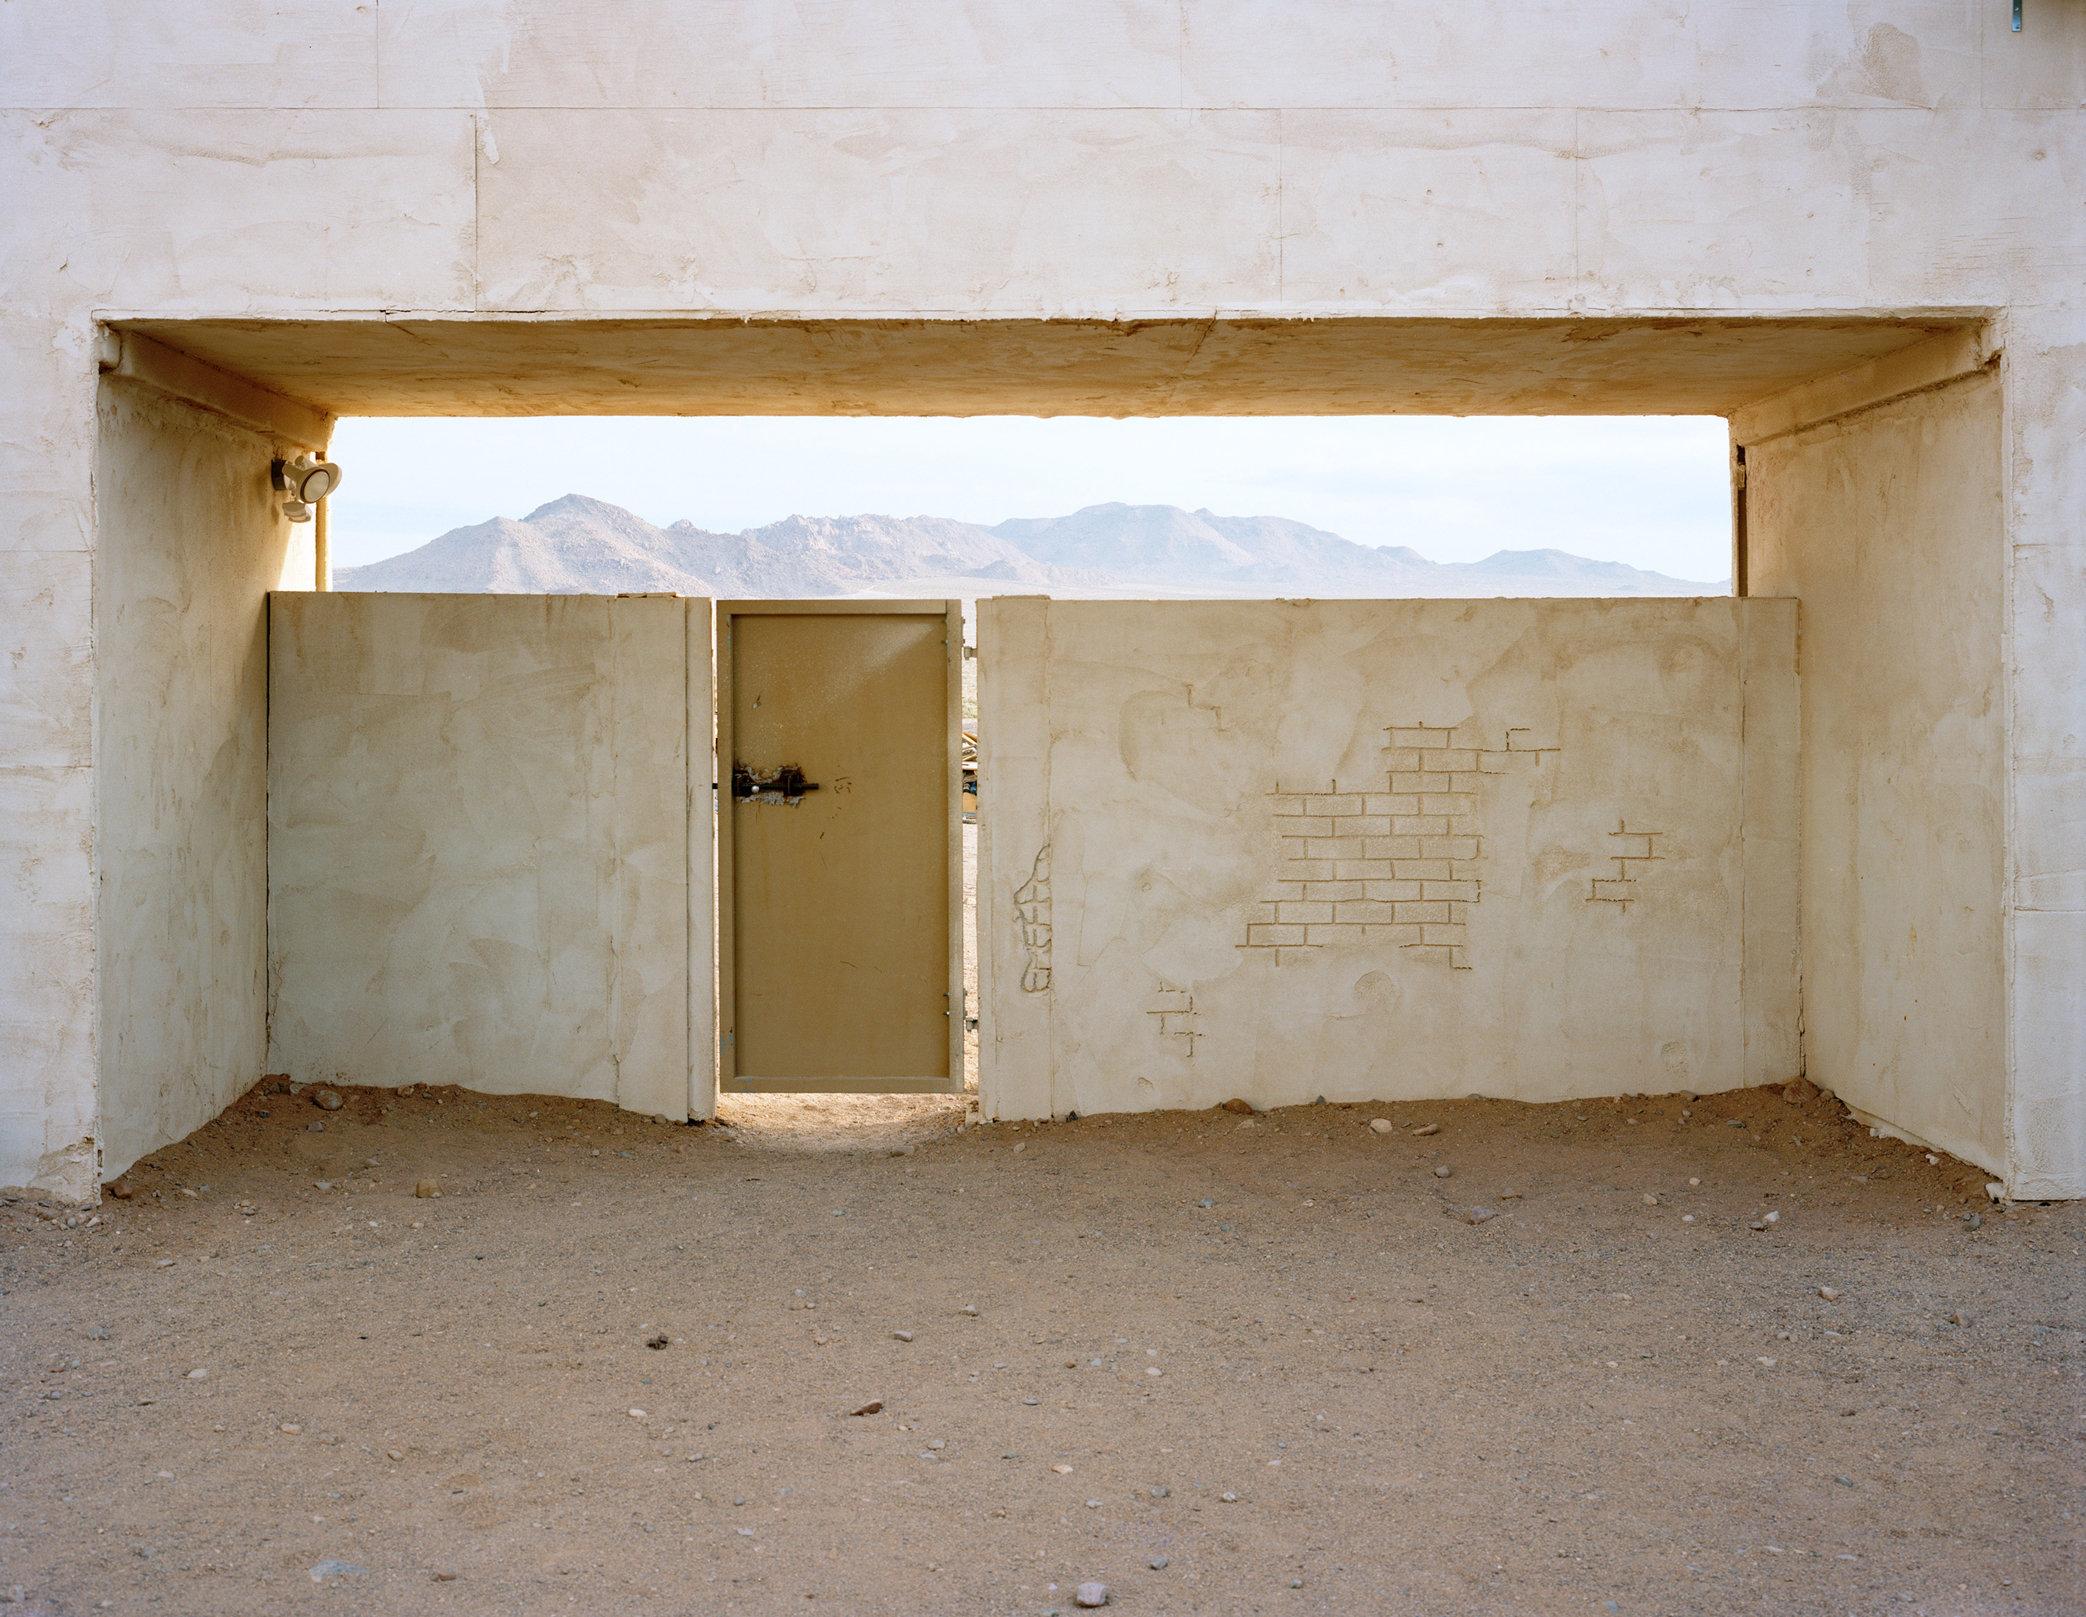 03_Beckett_Medina_Gate.jpg